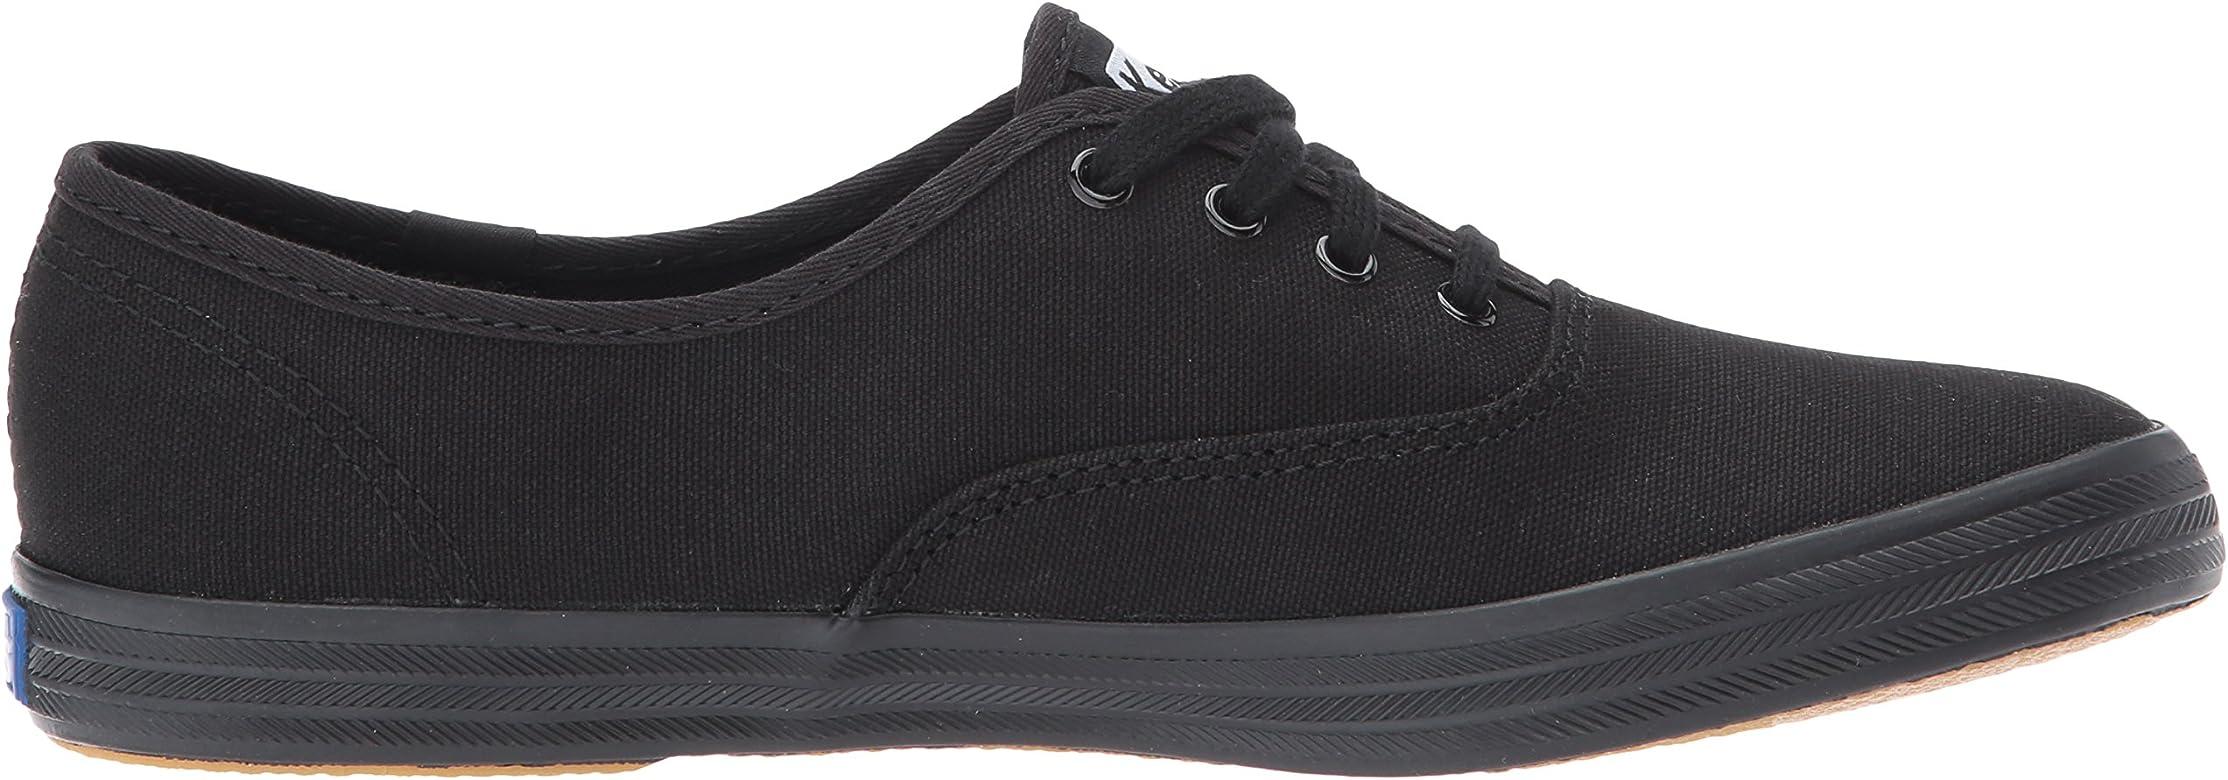 designer fashion eb470 62ea1 Keds Champion CVO, Damen Sneakers, Schwarz (Black), 38 EU ...